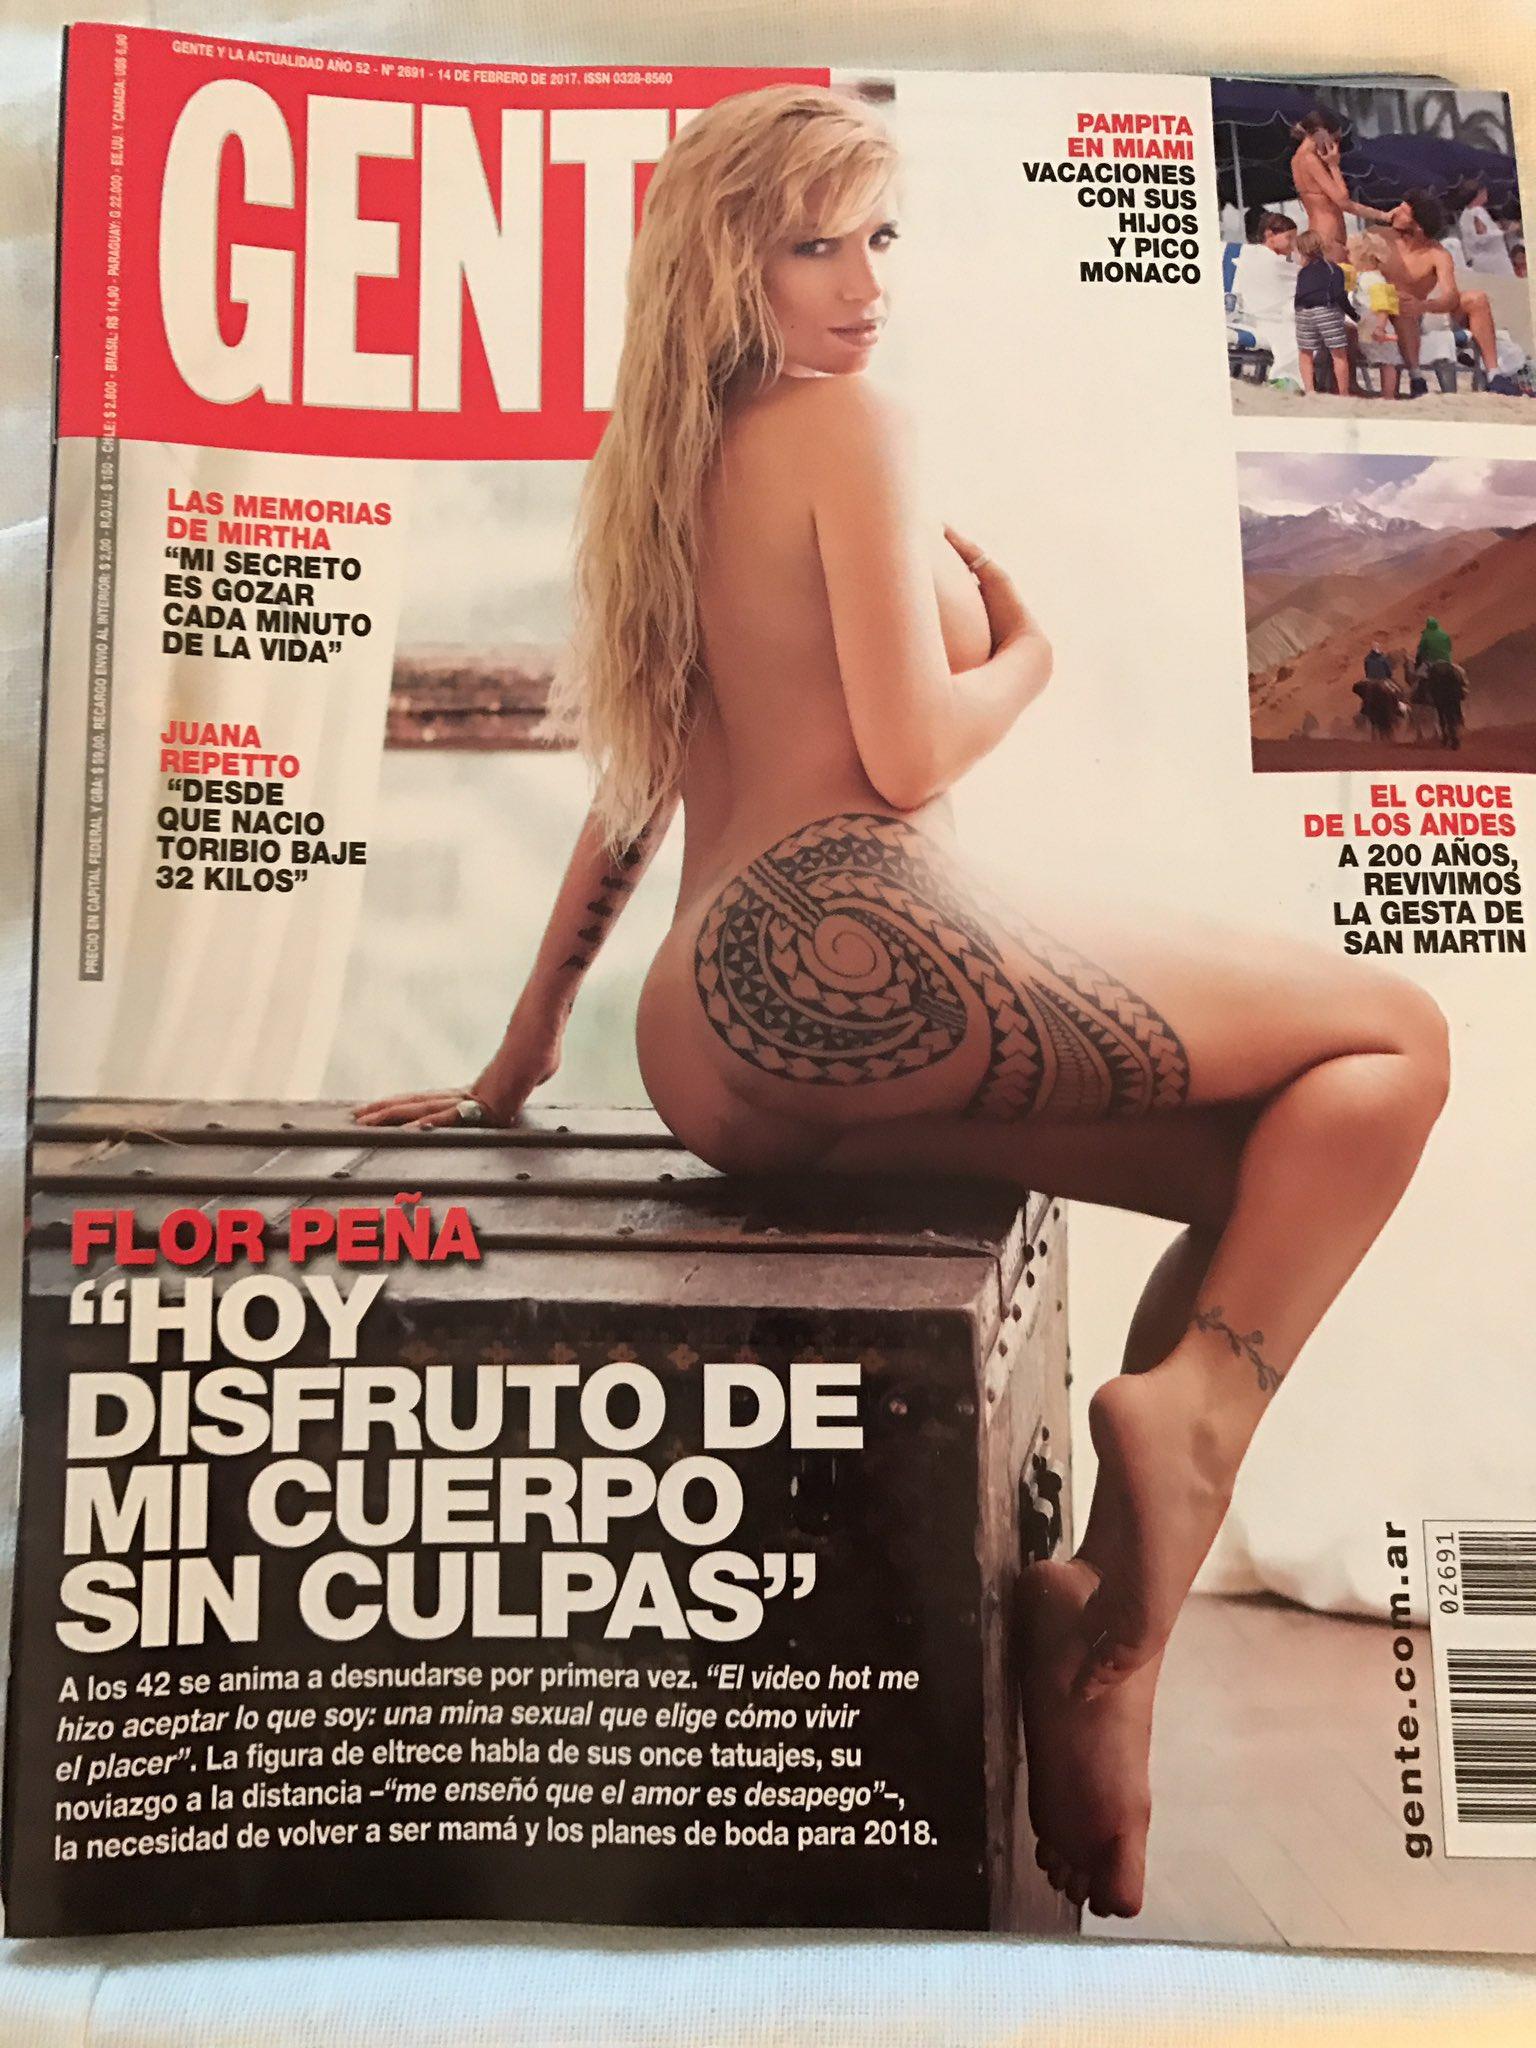 "Analia Desnuda 🅰🅽🅰🅻🅸🅰 🅵🆁🅰🅽🅲🅷🅸🅽 🤩 on twitter: ""tapa gente y"